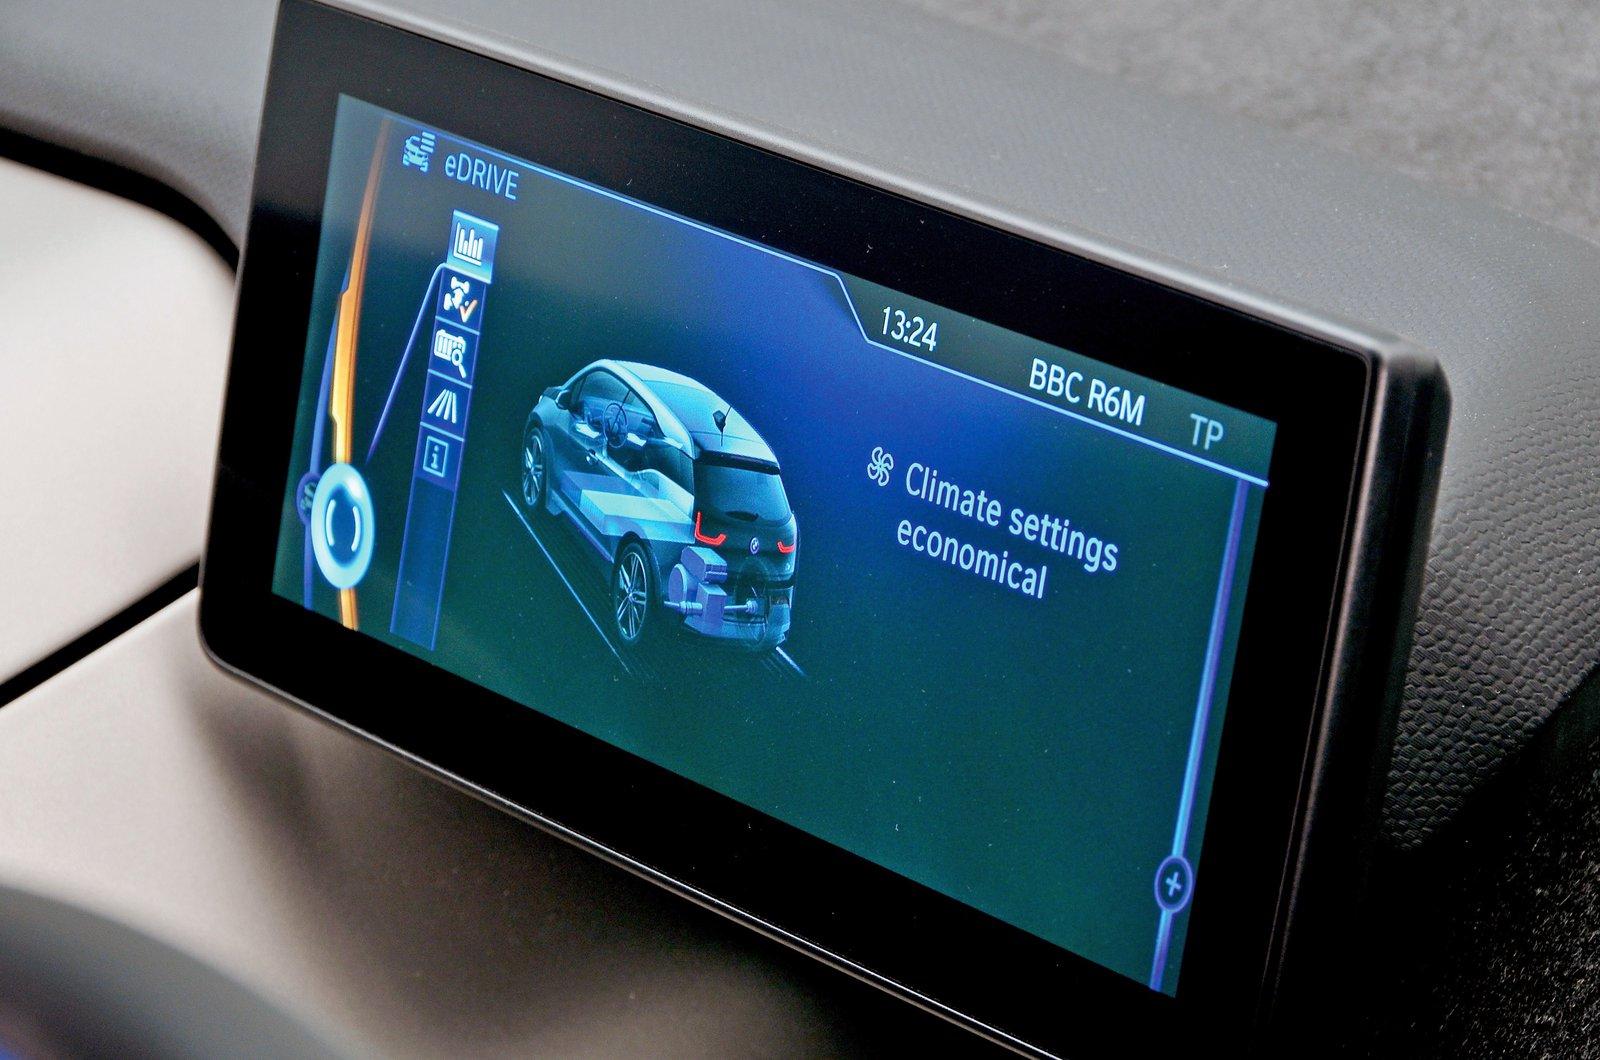 BMW i3 infotainment screen